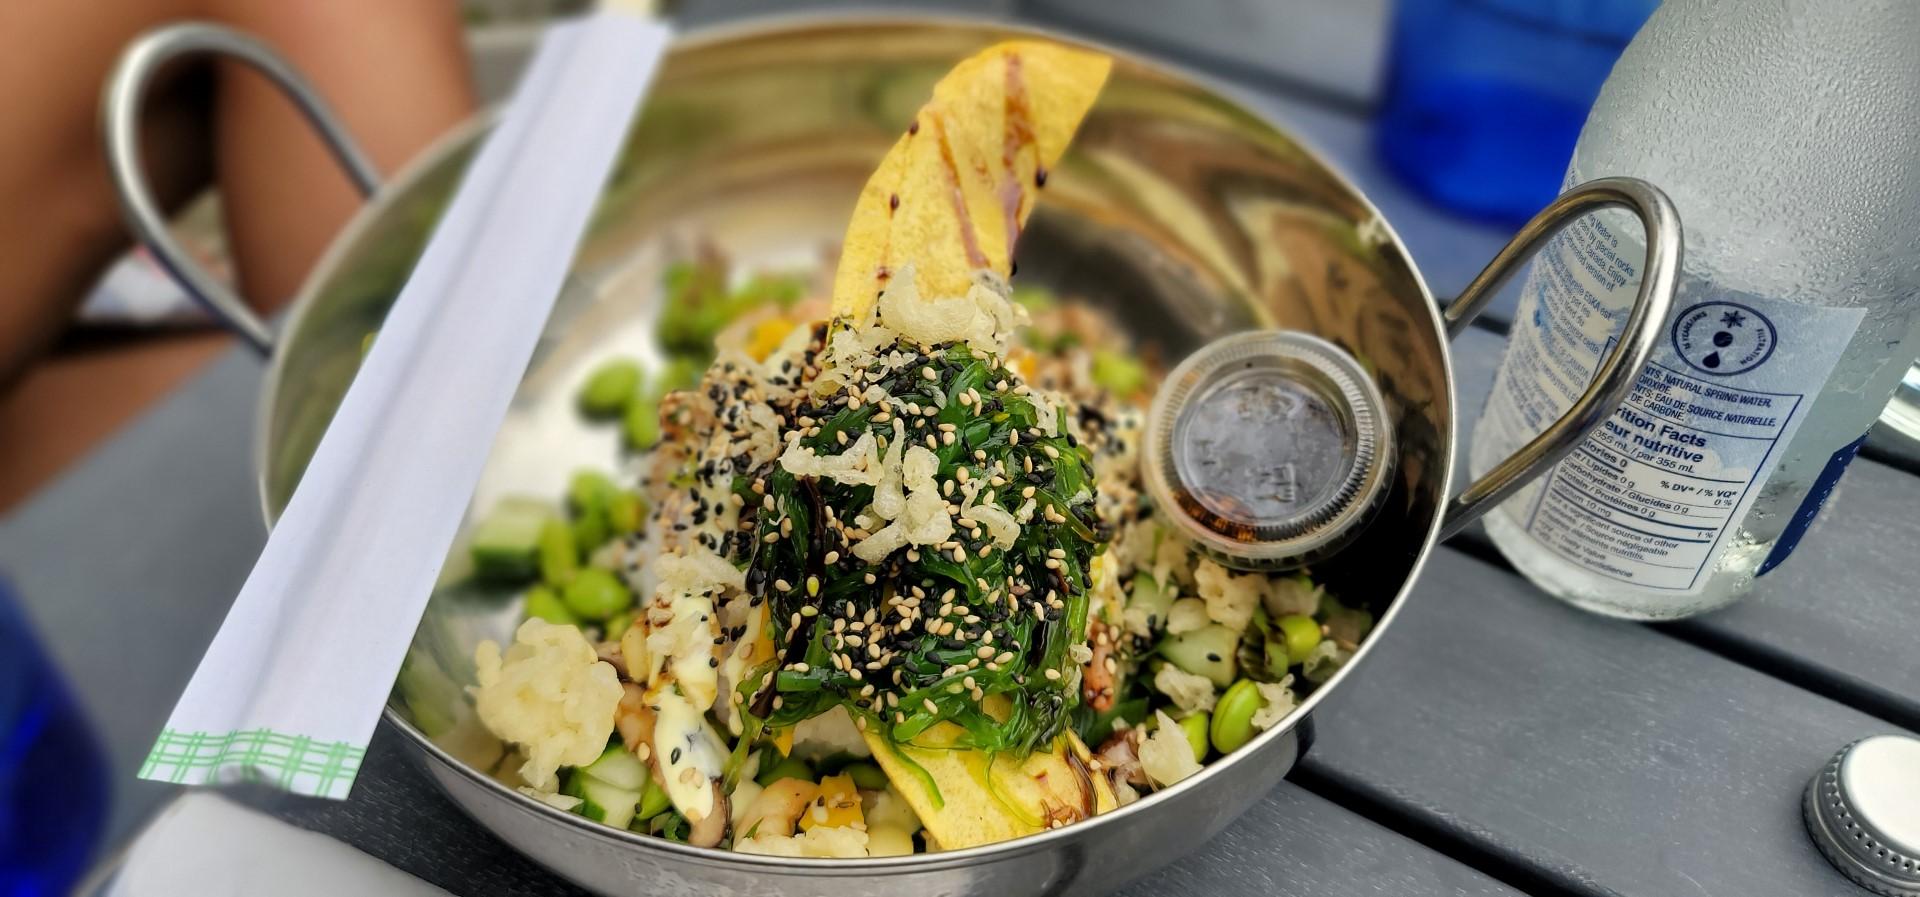 poke bowl with seaweed on top